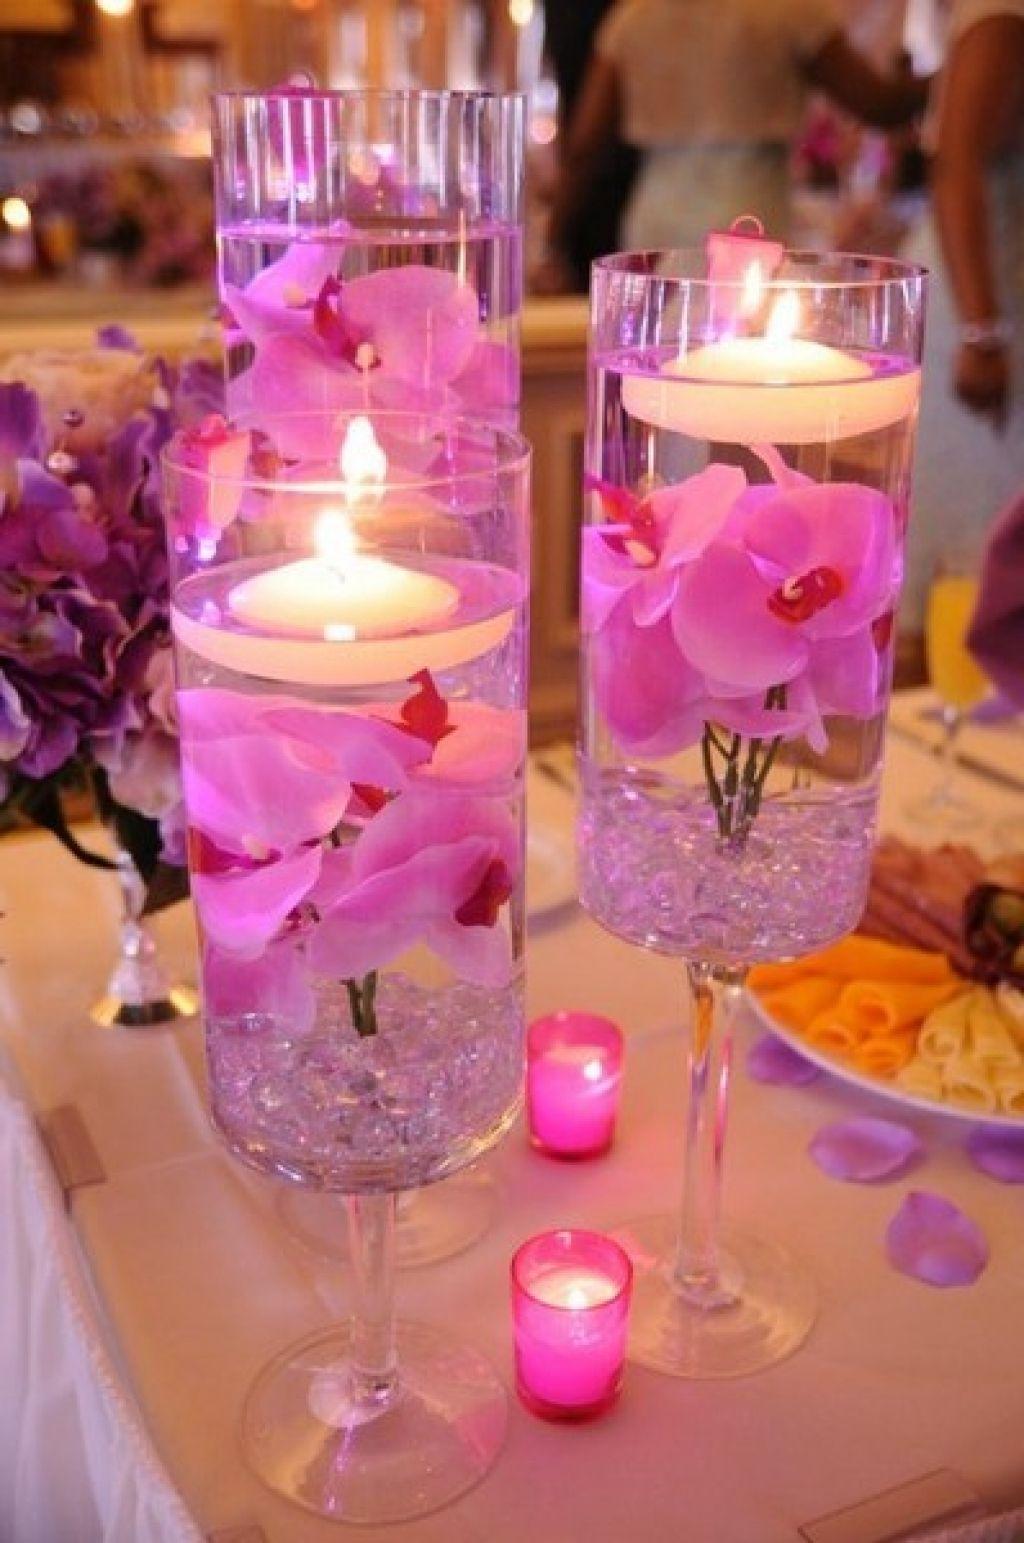 Diy elegant wedding decorations  wedding centerpieces diy weddings superweddings wedding decorations